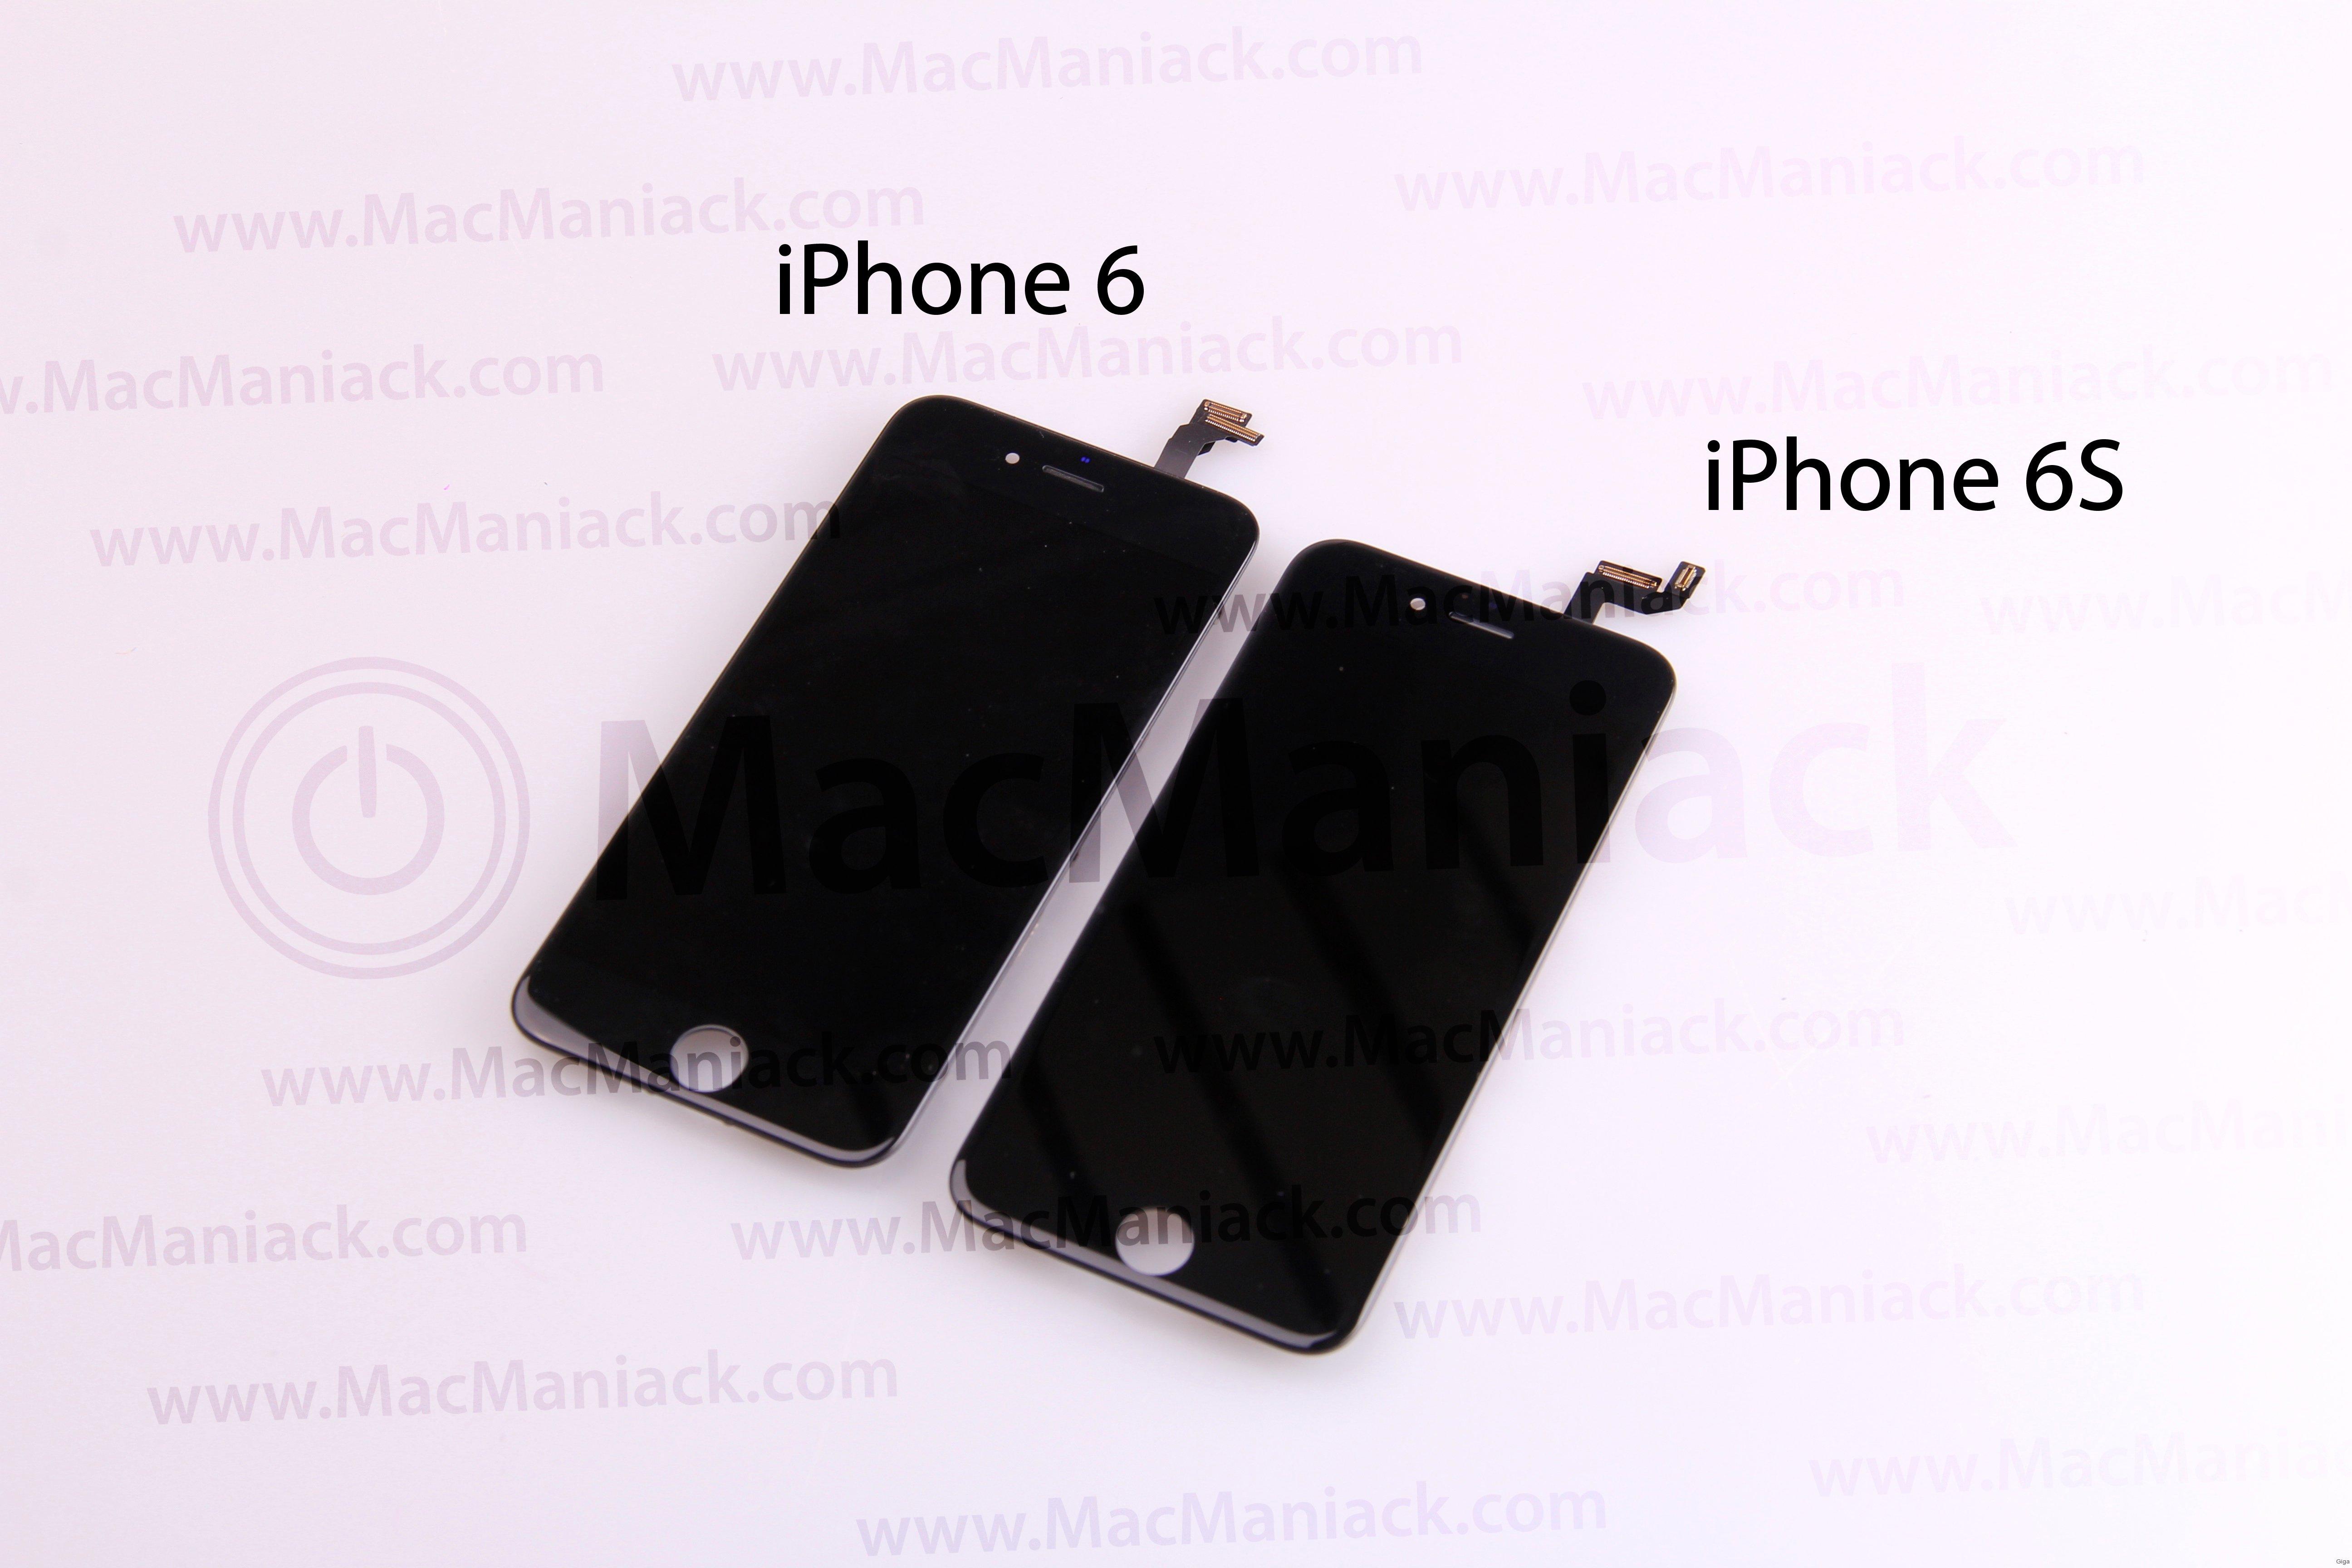 iphone 6s vs iphone 6 videovergleich der beiden displays giga. Black Bedroom Furniture Sets. Home Design Ideas